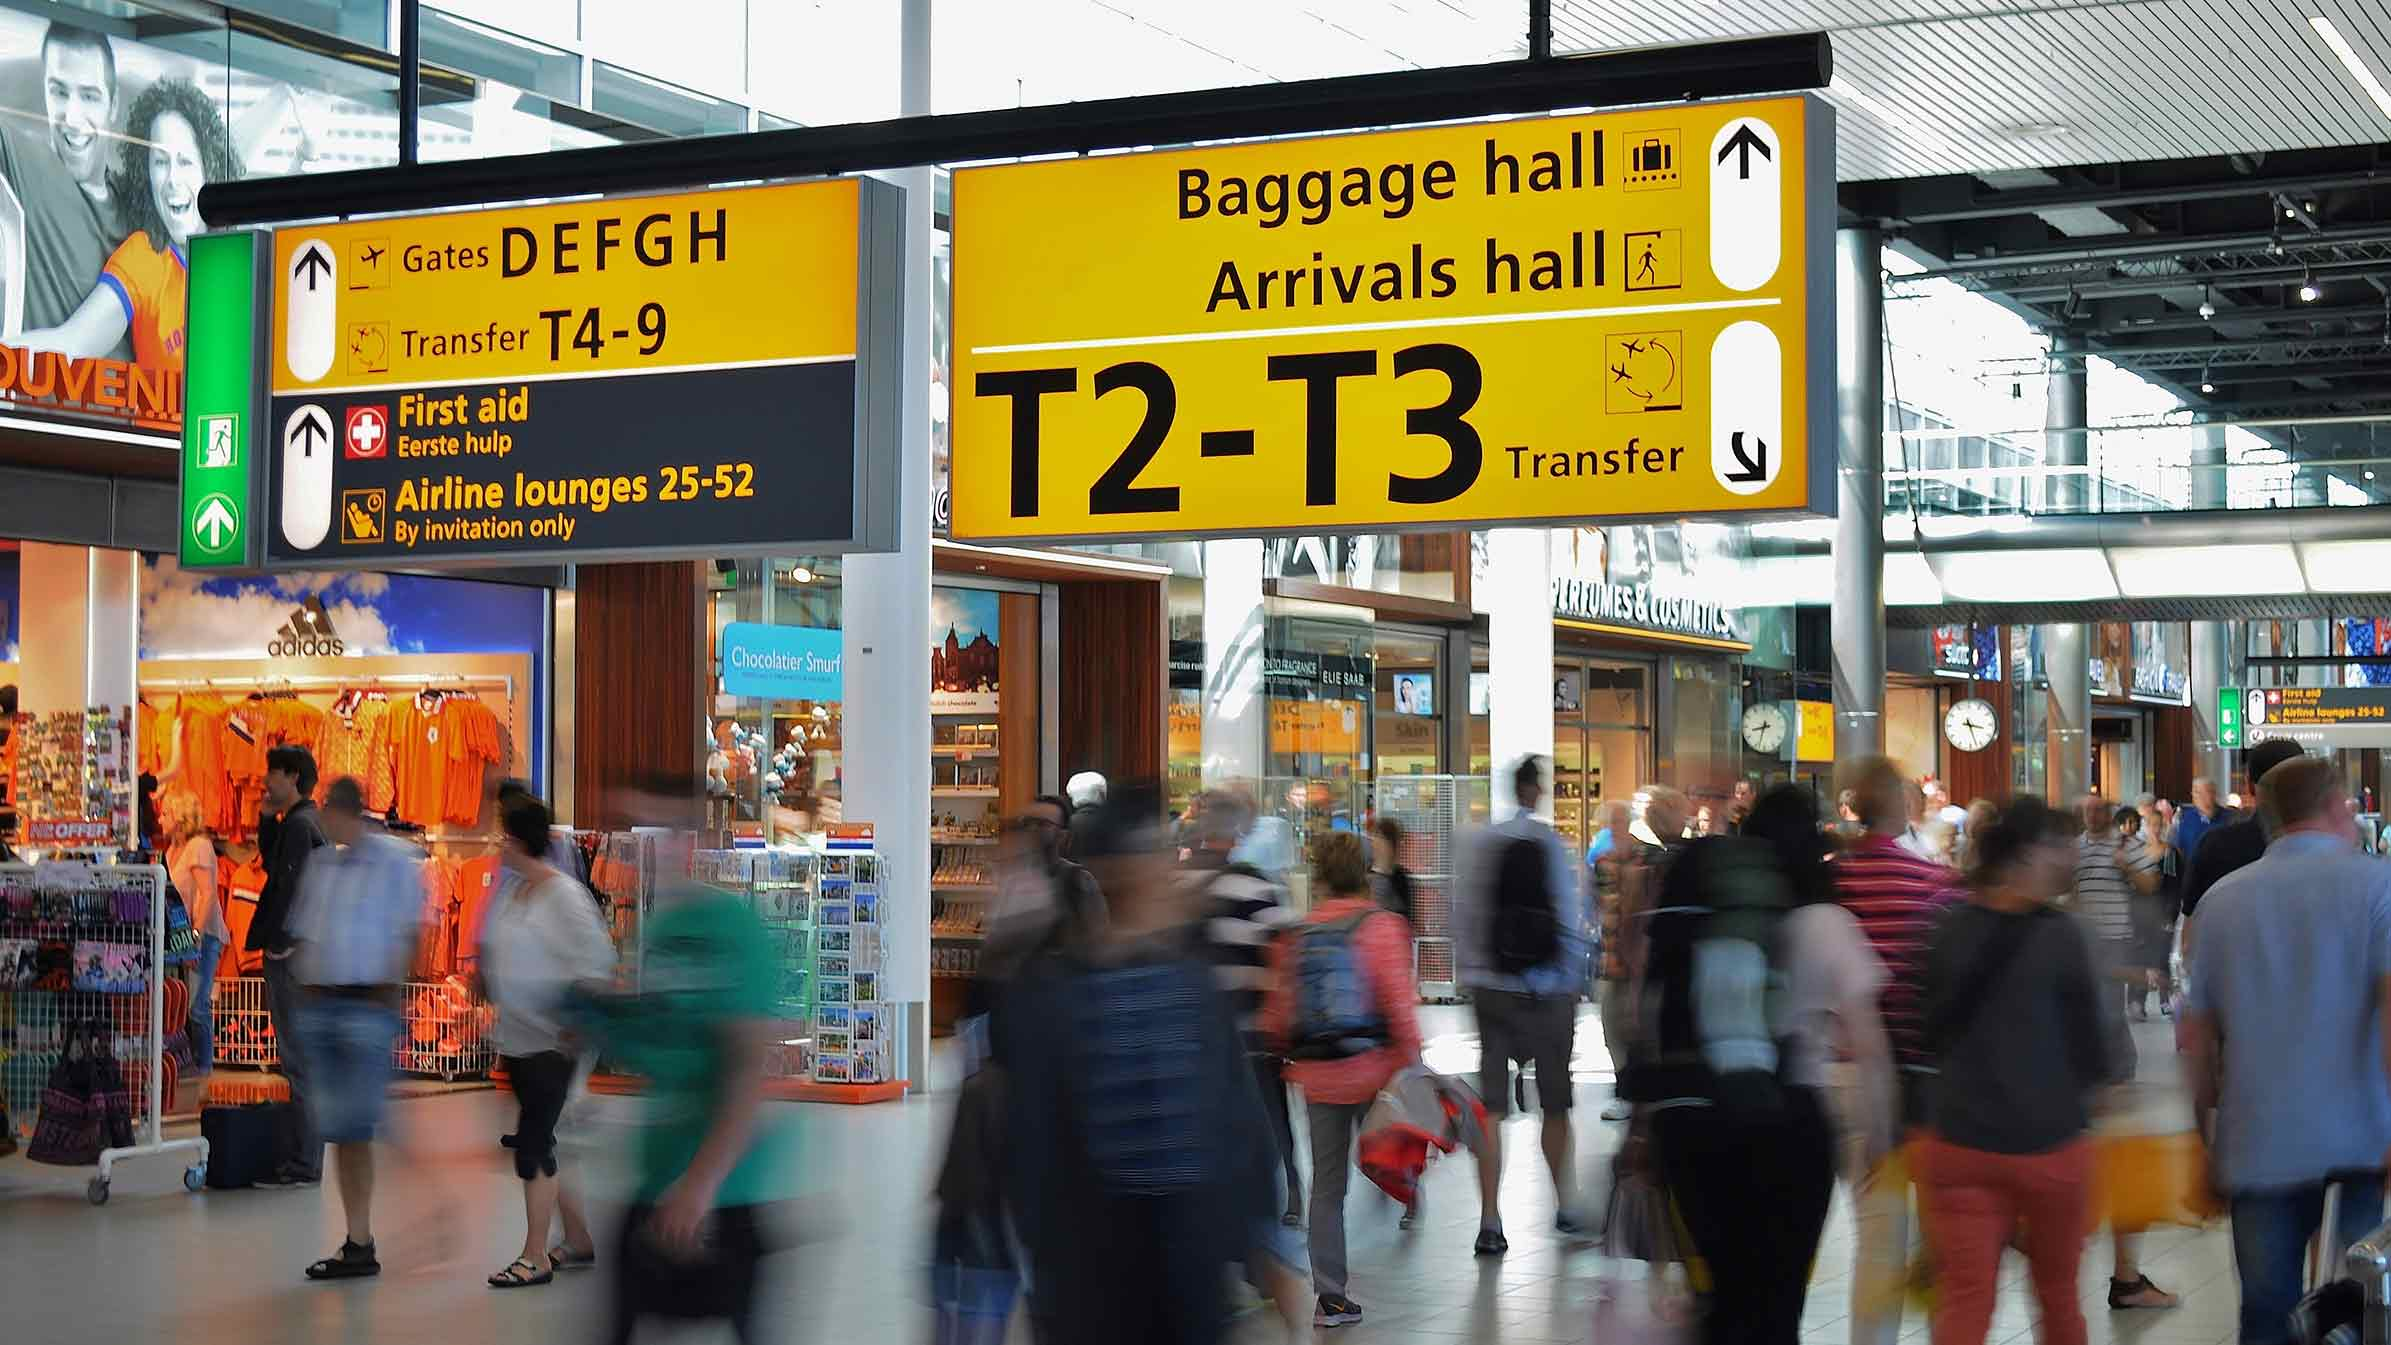 Airport-Amsterdam-Blurred-People-Walking